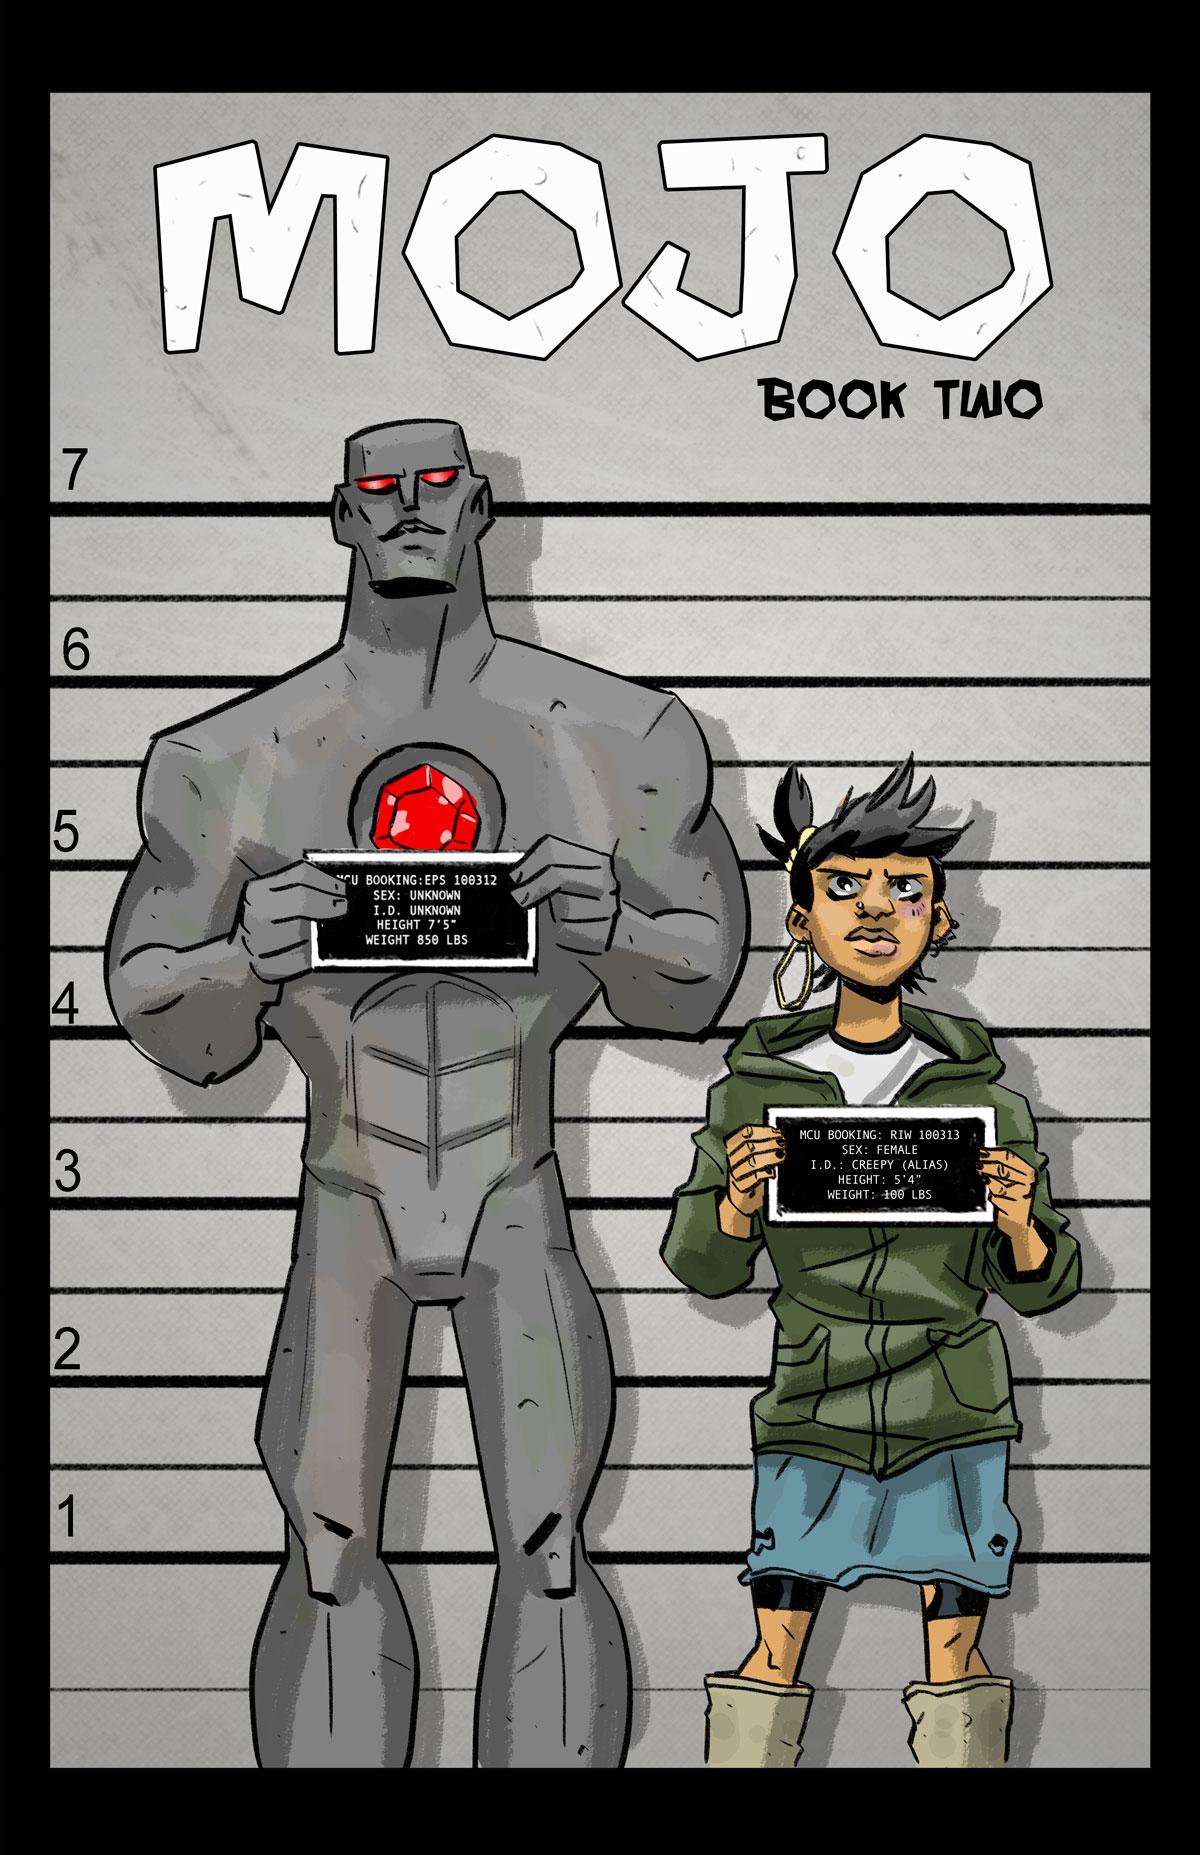 BOOK2_cover.jpg